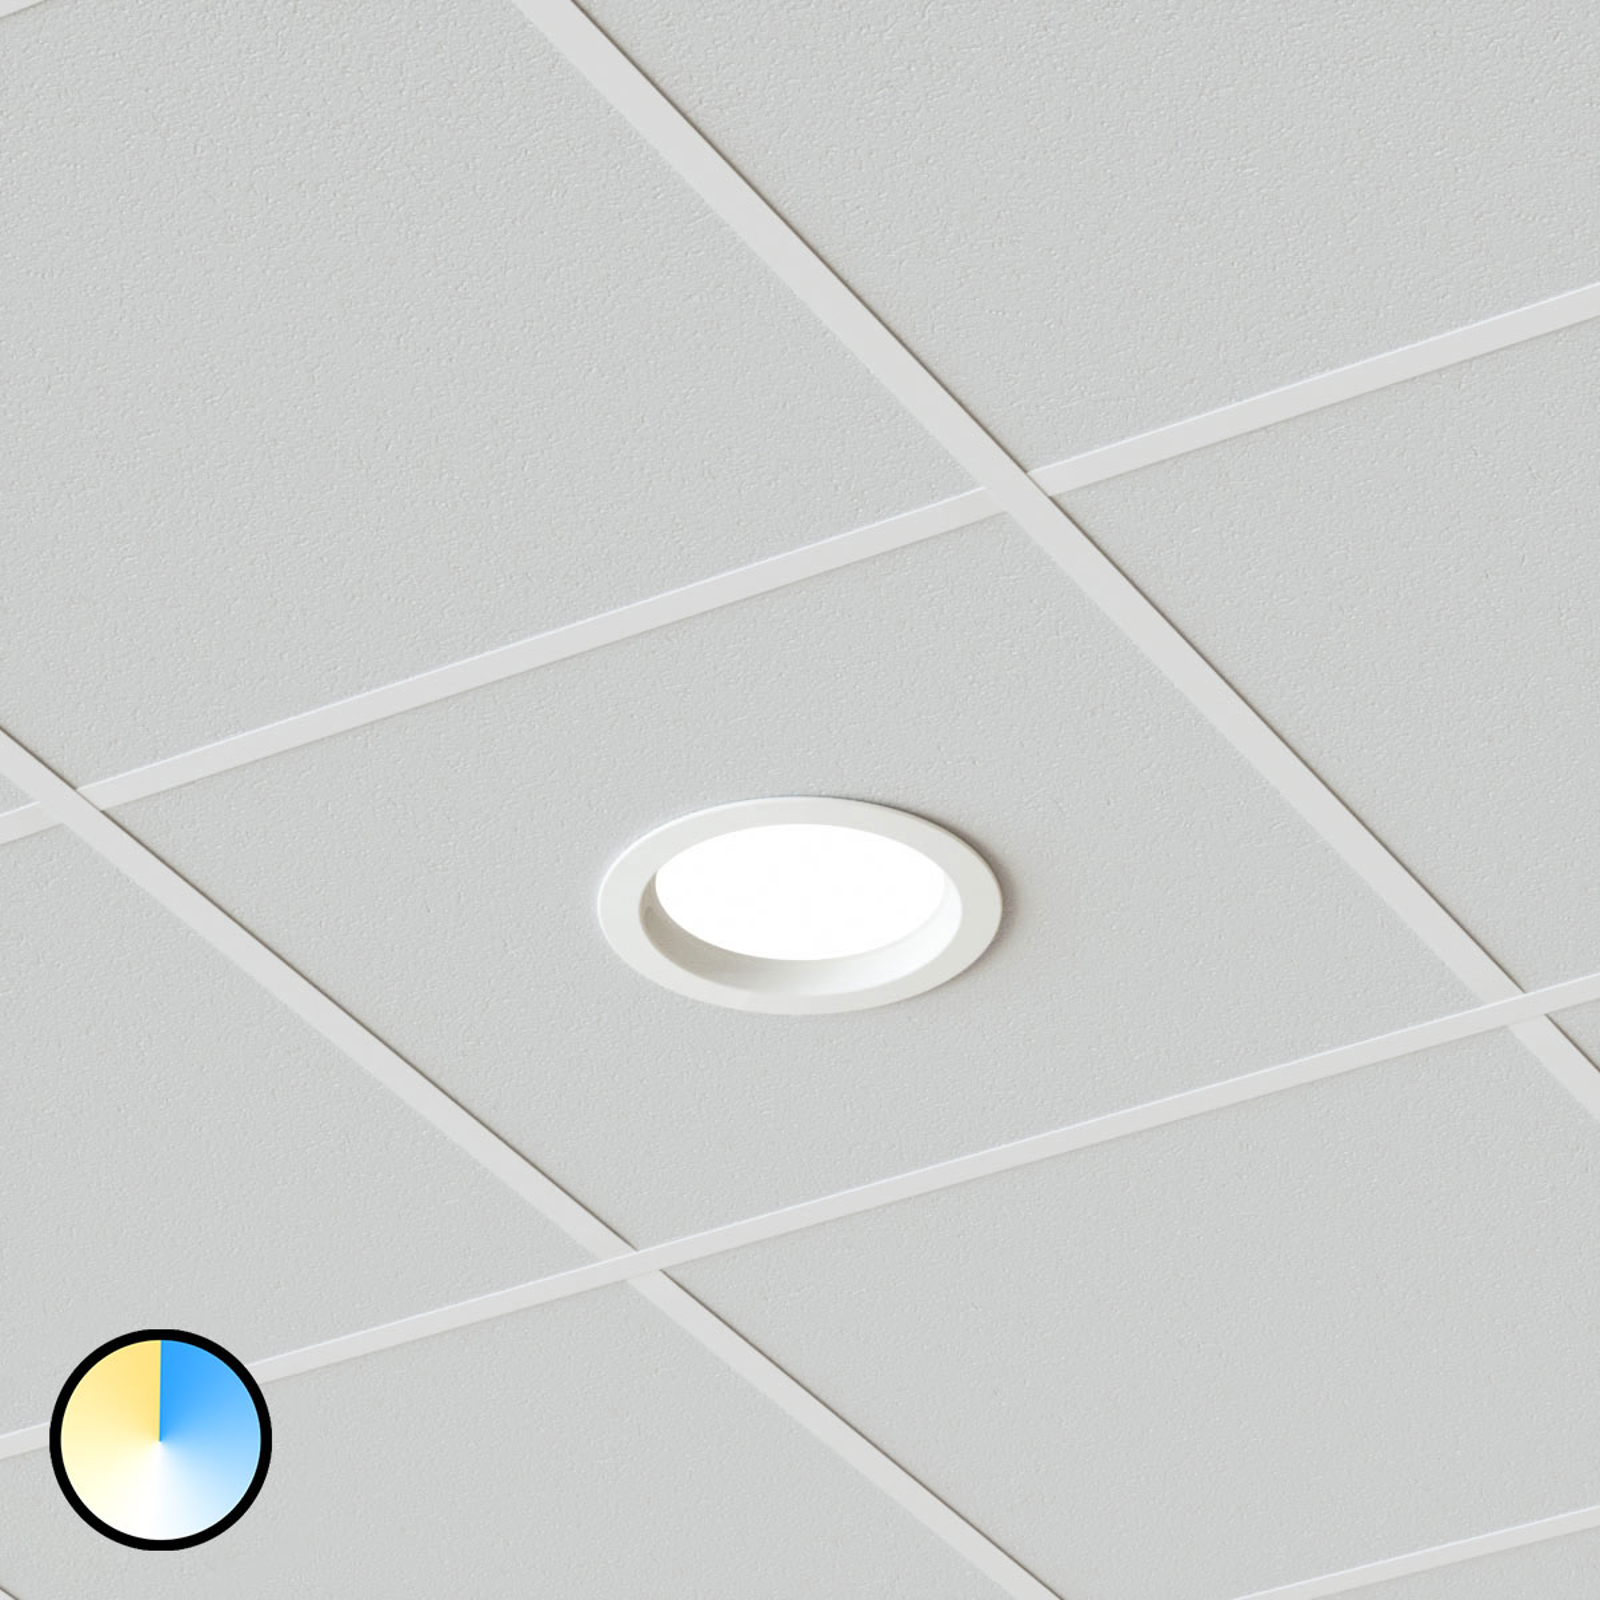 27 W LED-Einbaustrahler Piet, 3.000K 4.000K 6.000K